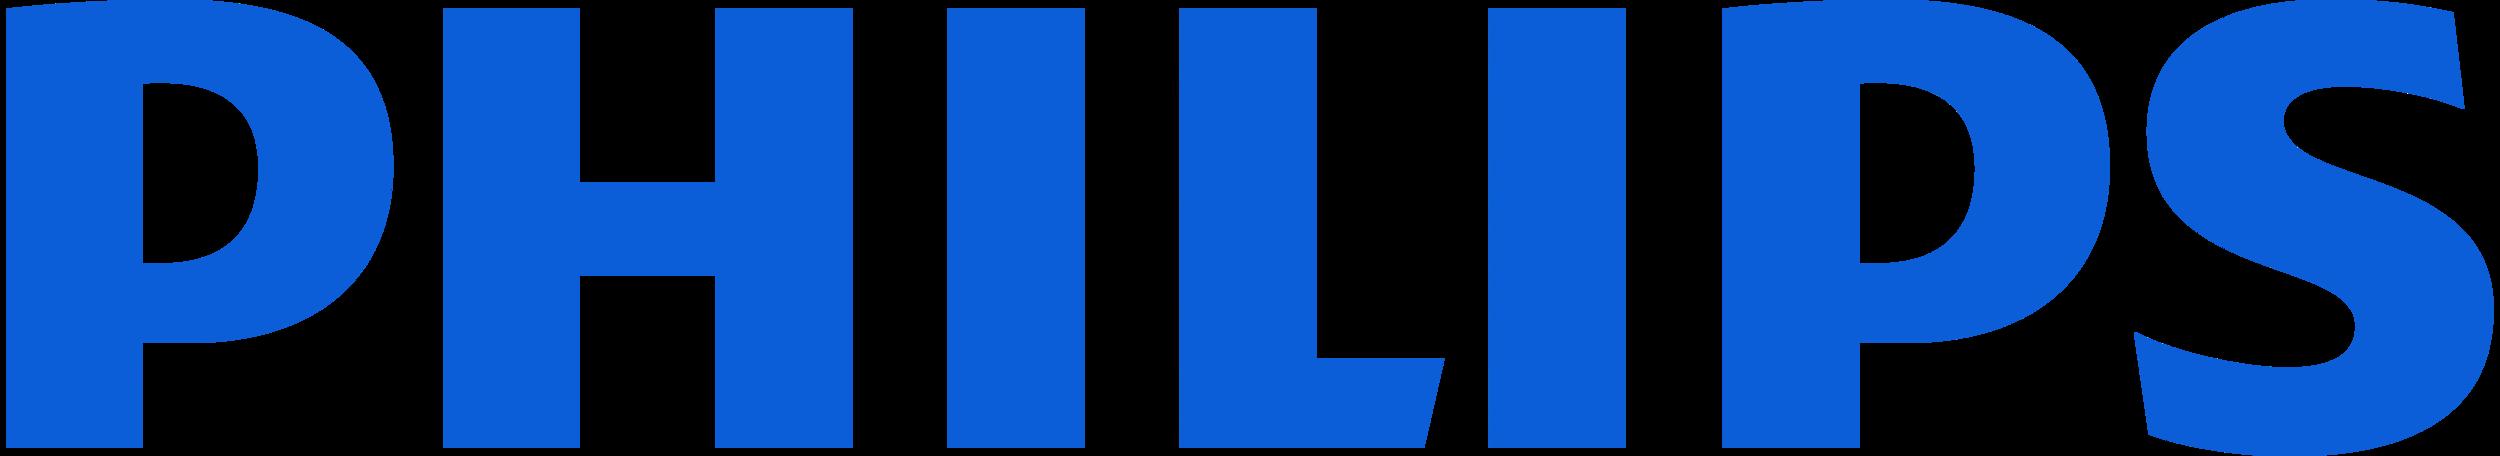 Philips_logo_logotype_emblem-1.png